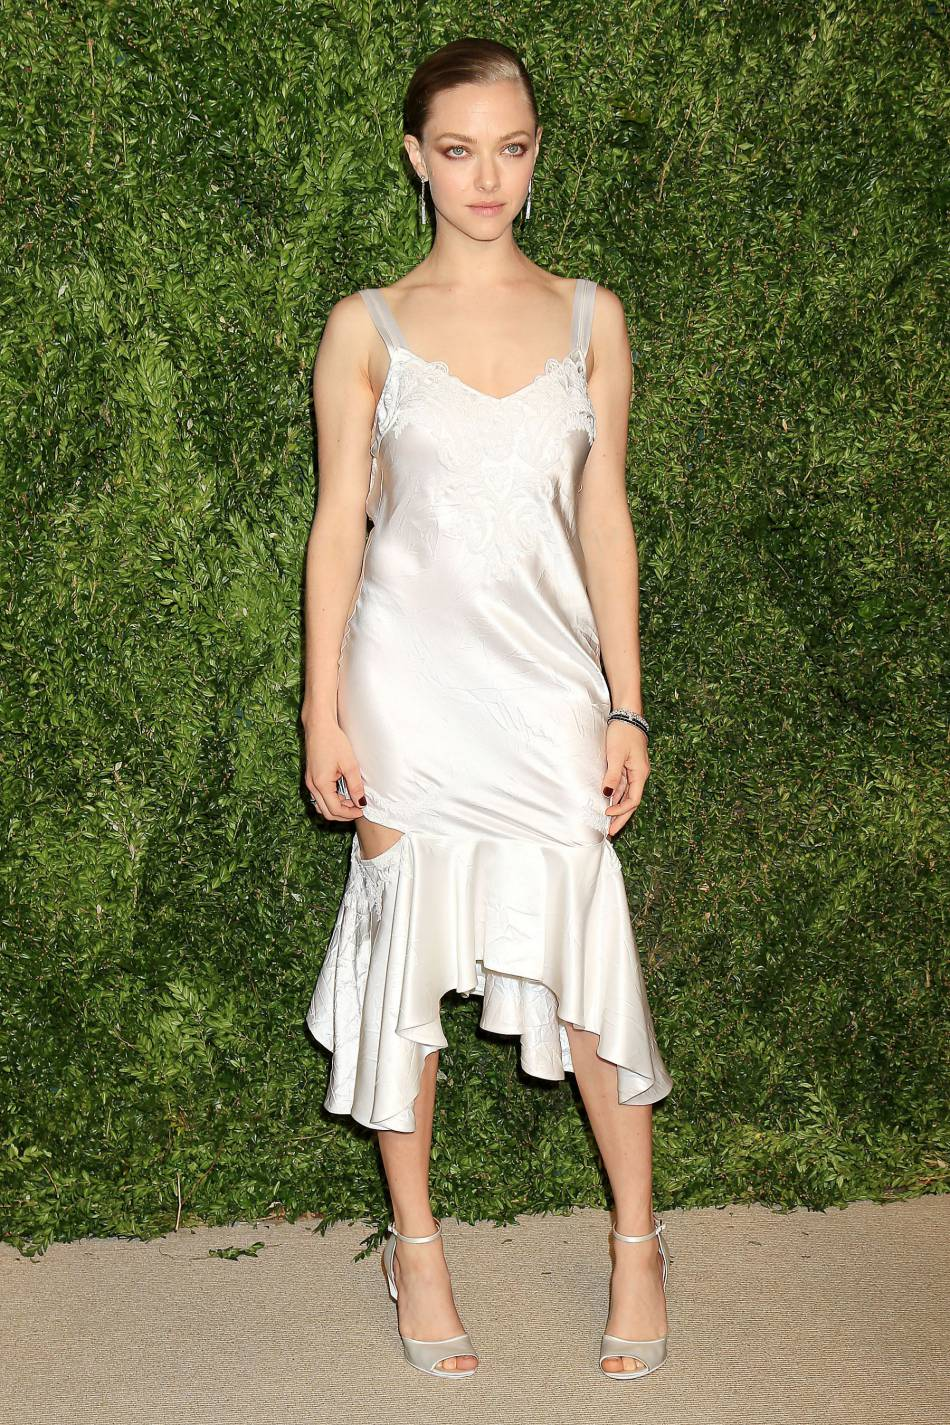 Amanda Seyfried à la soirée CFDA/Vogue Fashion Fund Awards de ce lundi 2 novembre 2015.